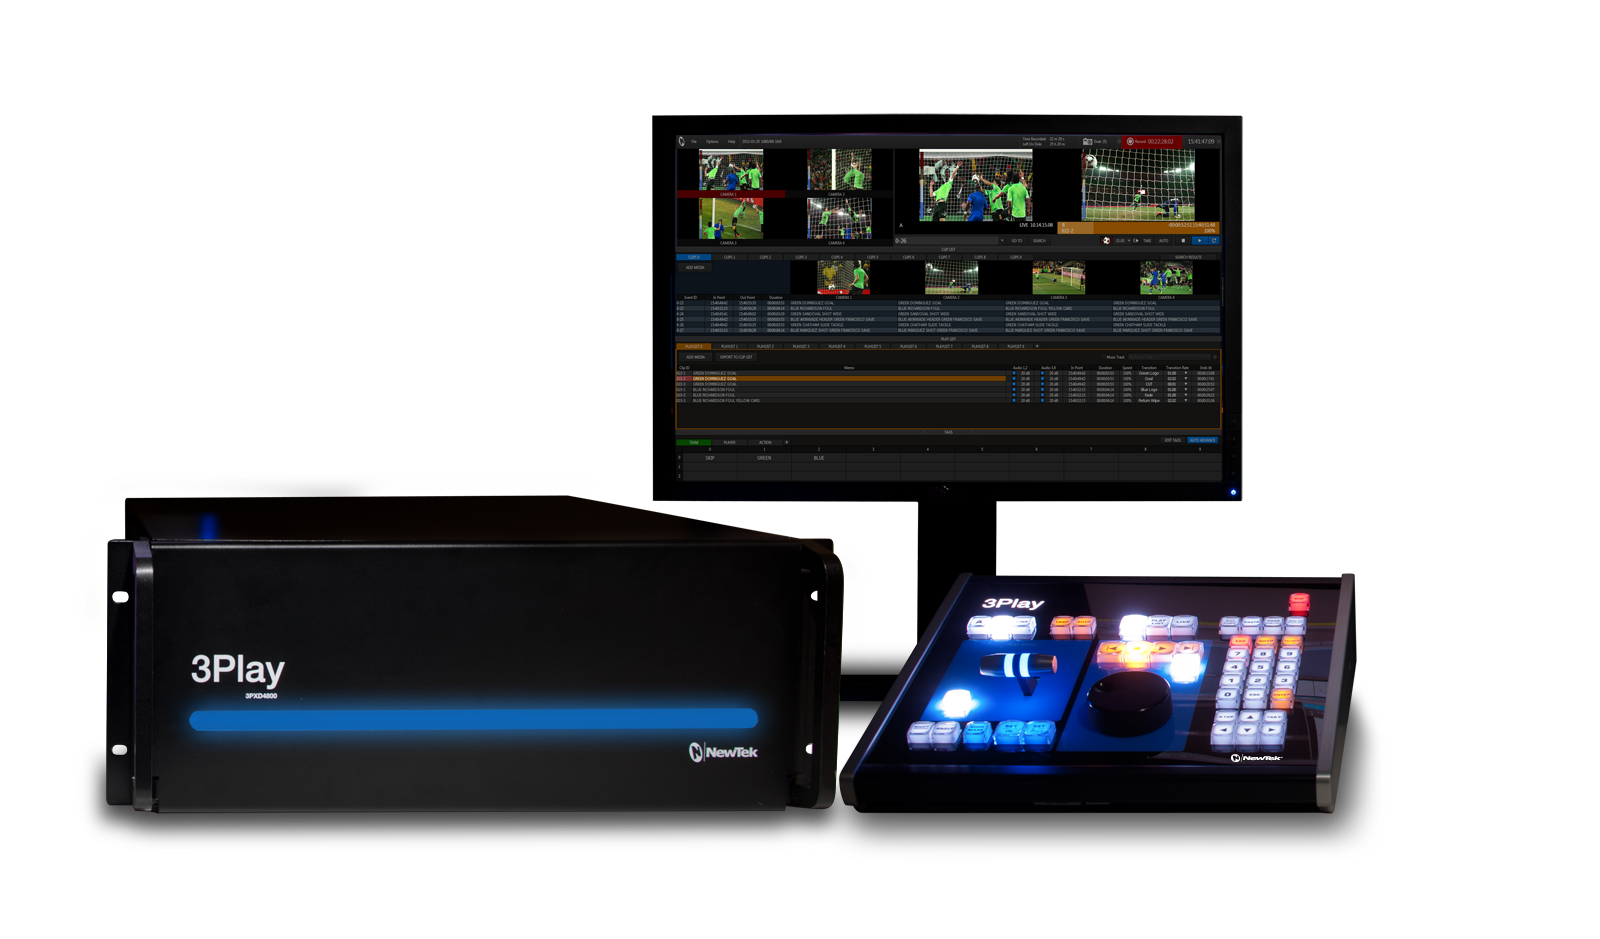 NewTek Unveils 3Play 4800 4